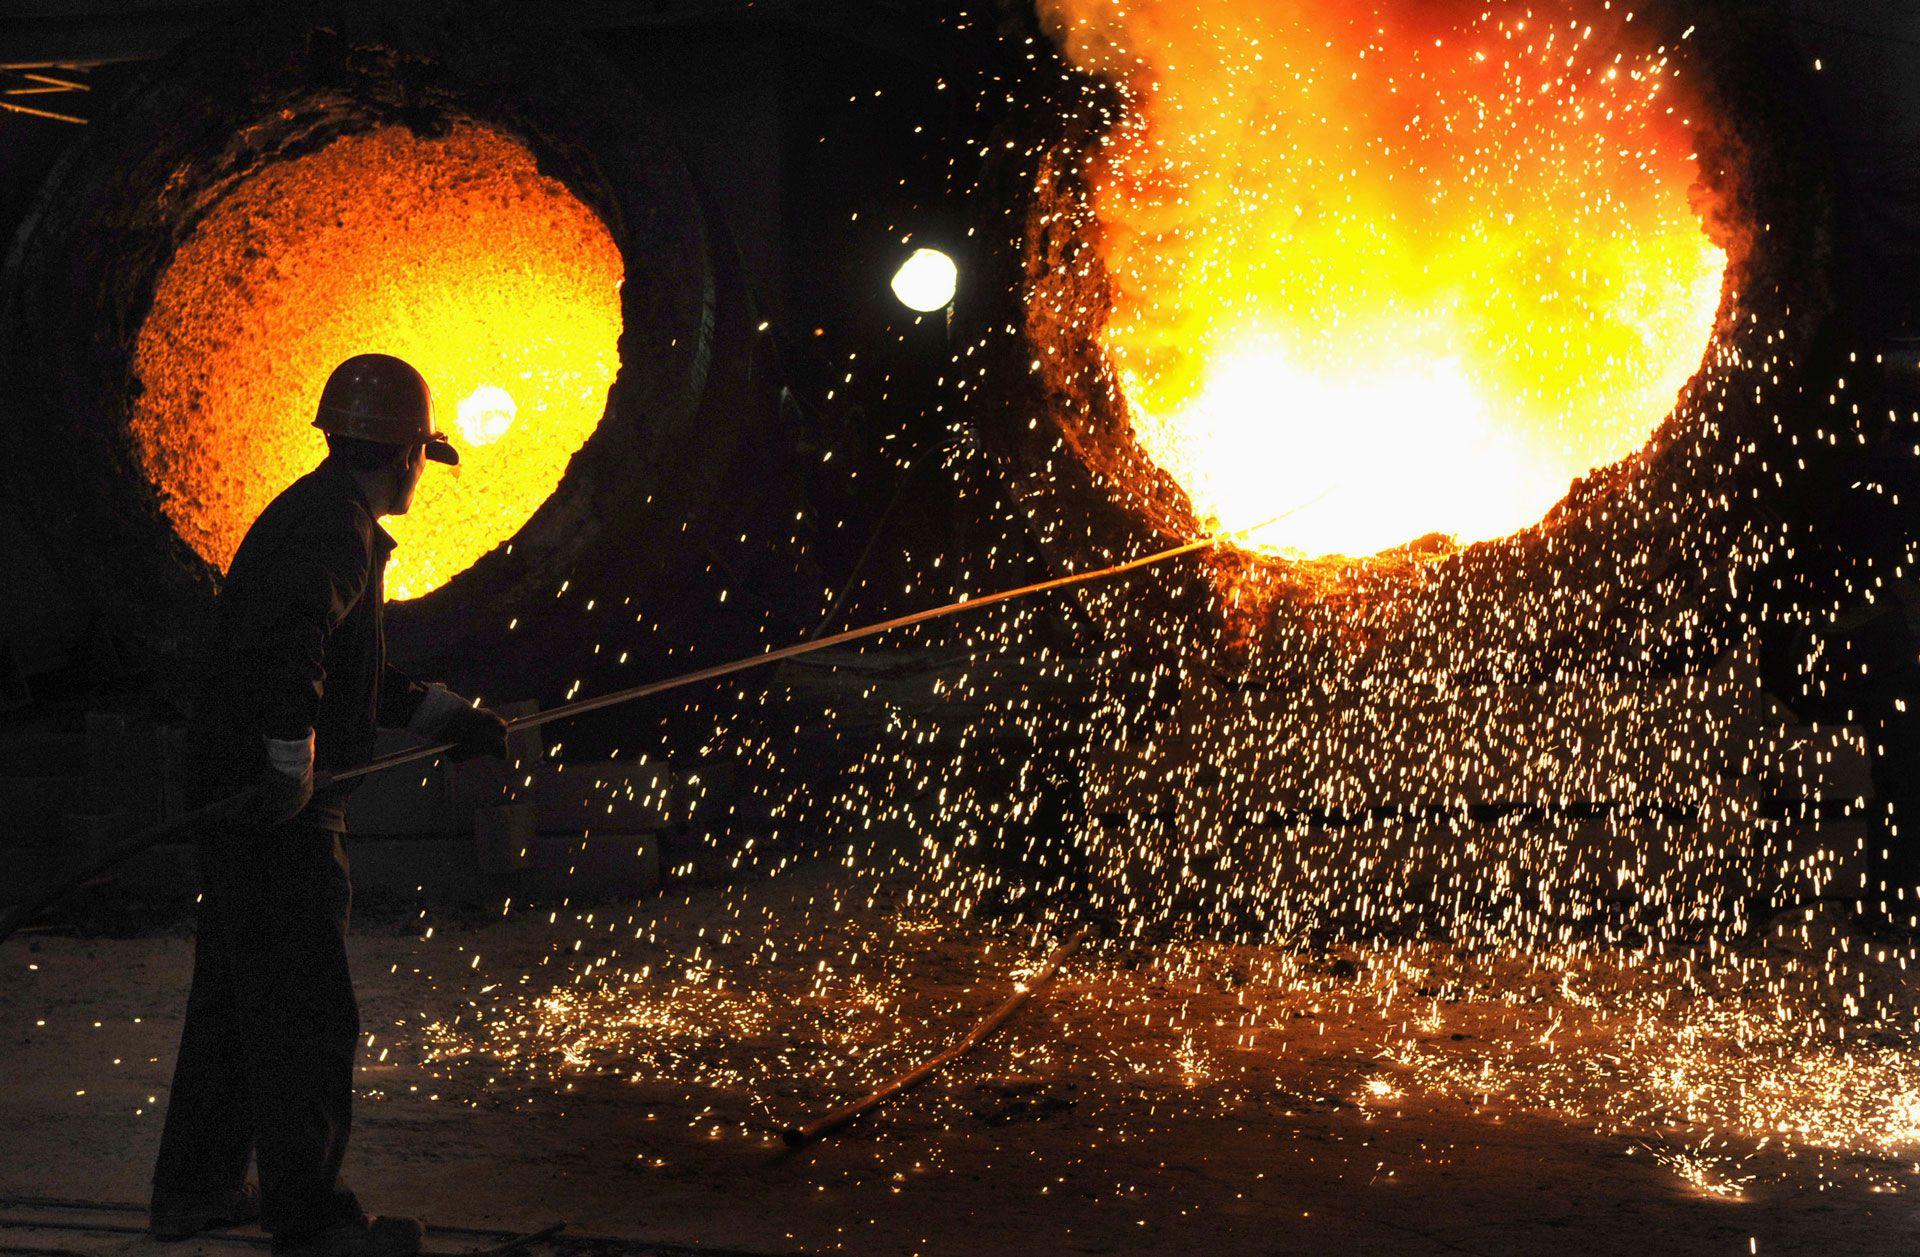 Engineering Services & Iron Works In Karachi Pakistan